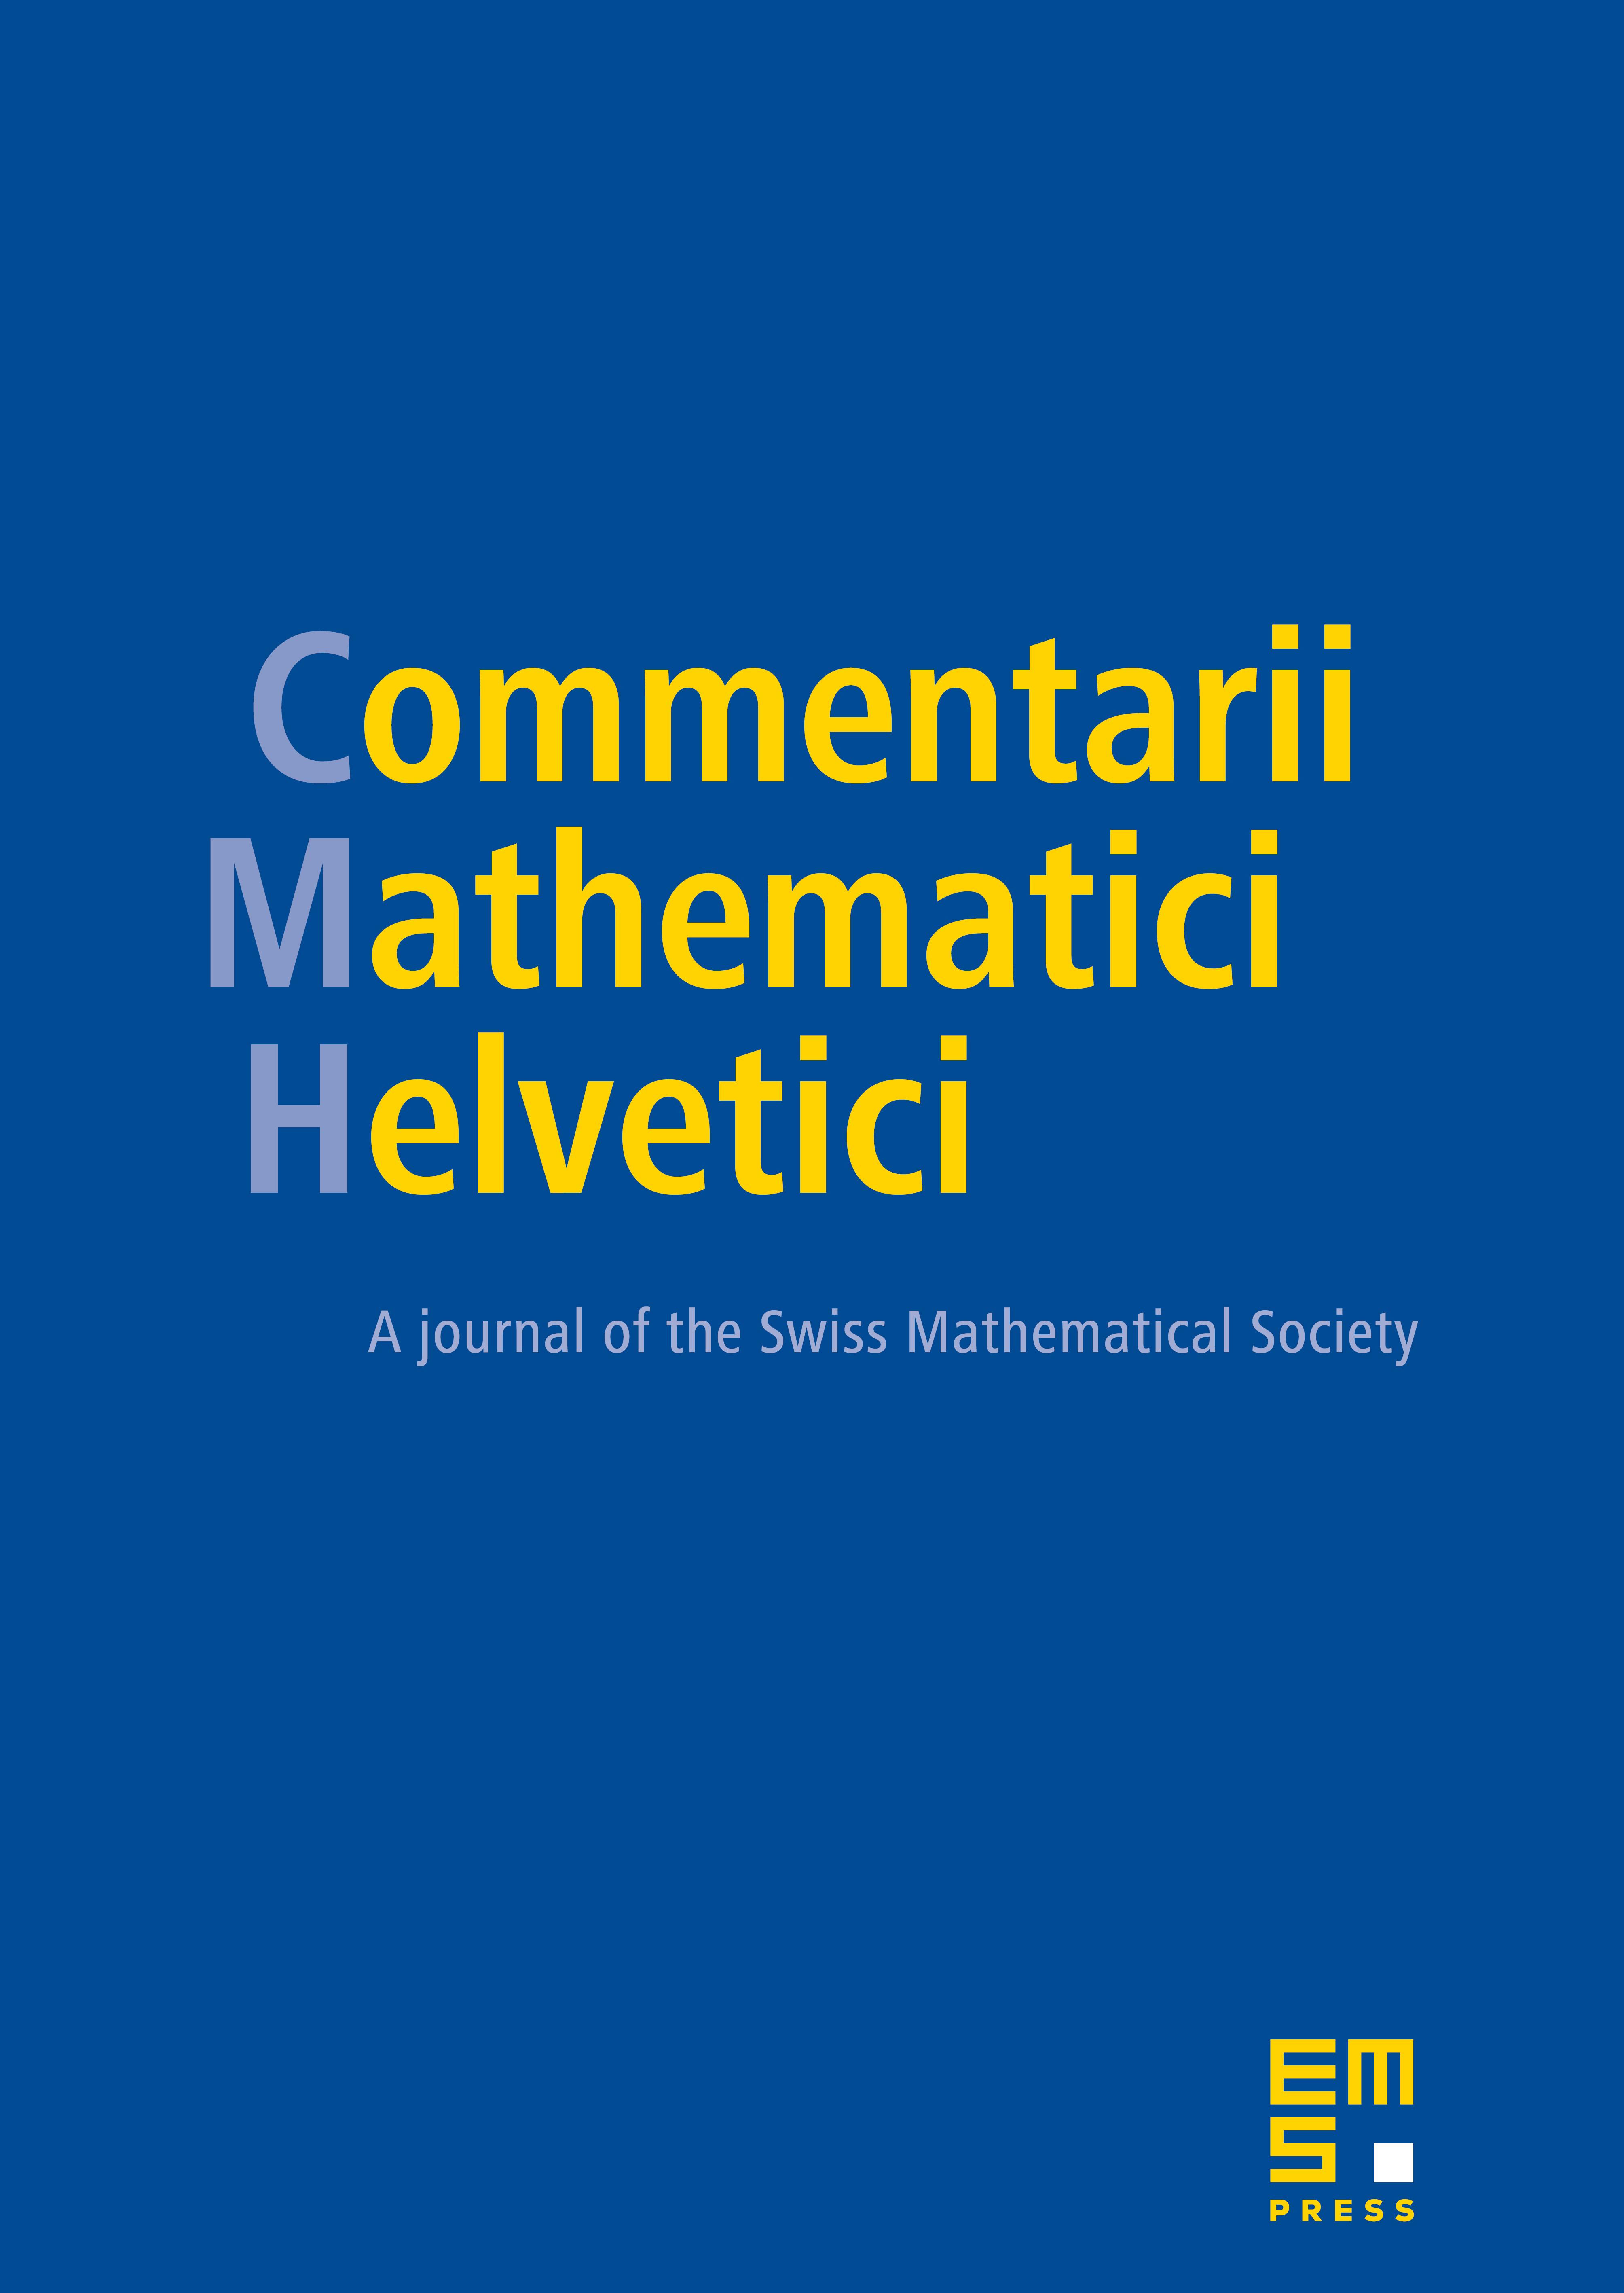 Commentarii Mathematici Helvetici cover